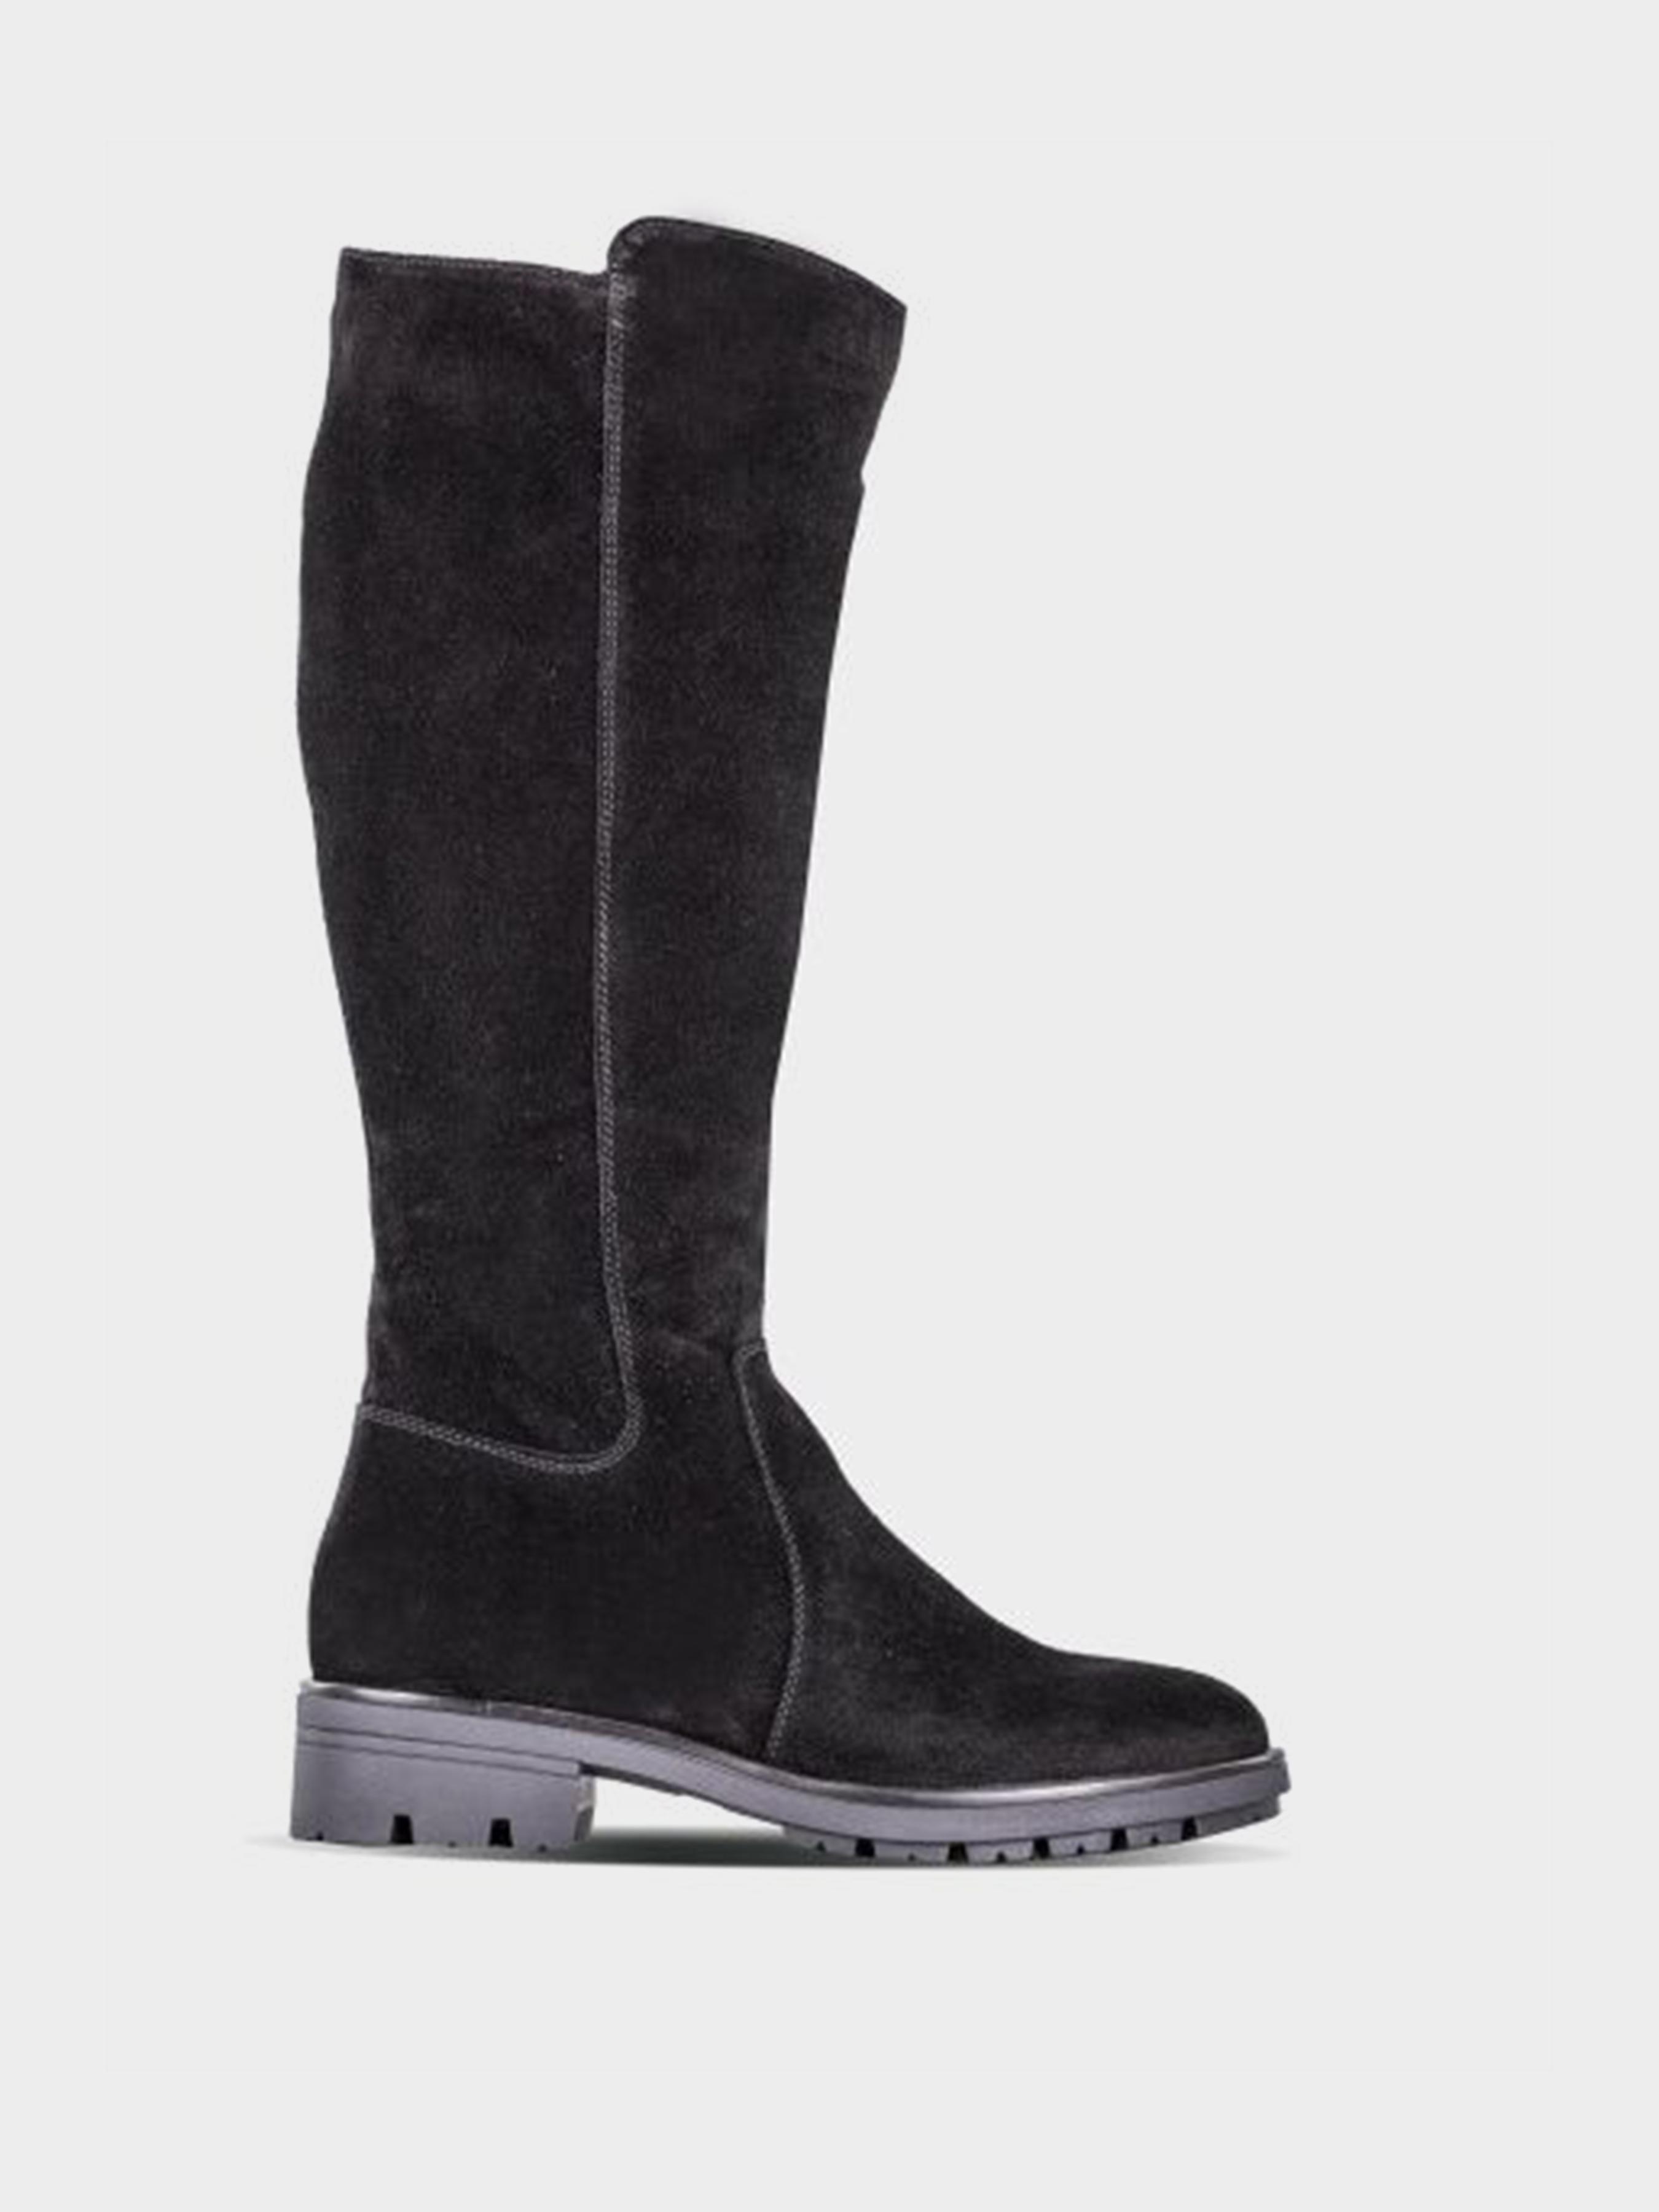 Сапоги для женщин Camalini MIU 0E10 размеры обуви, 2017